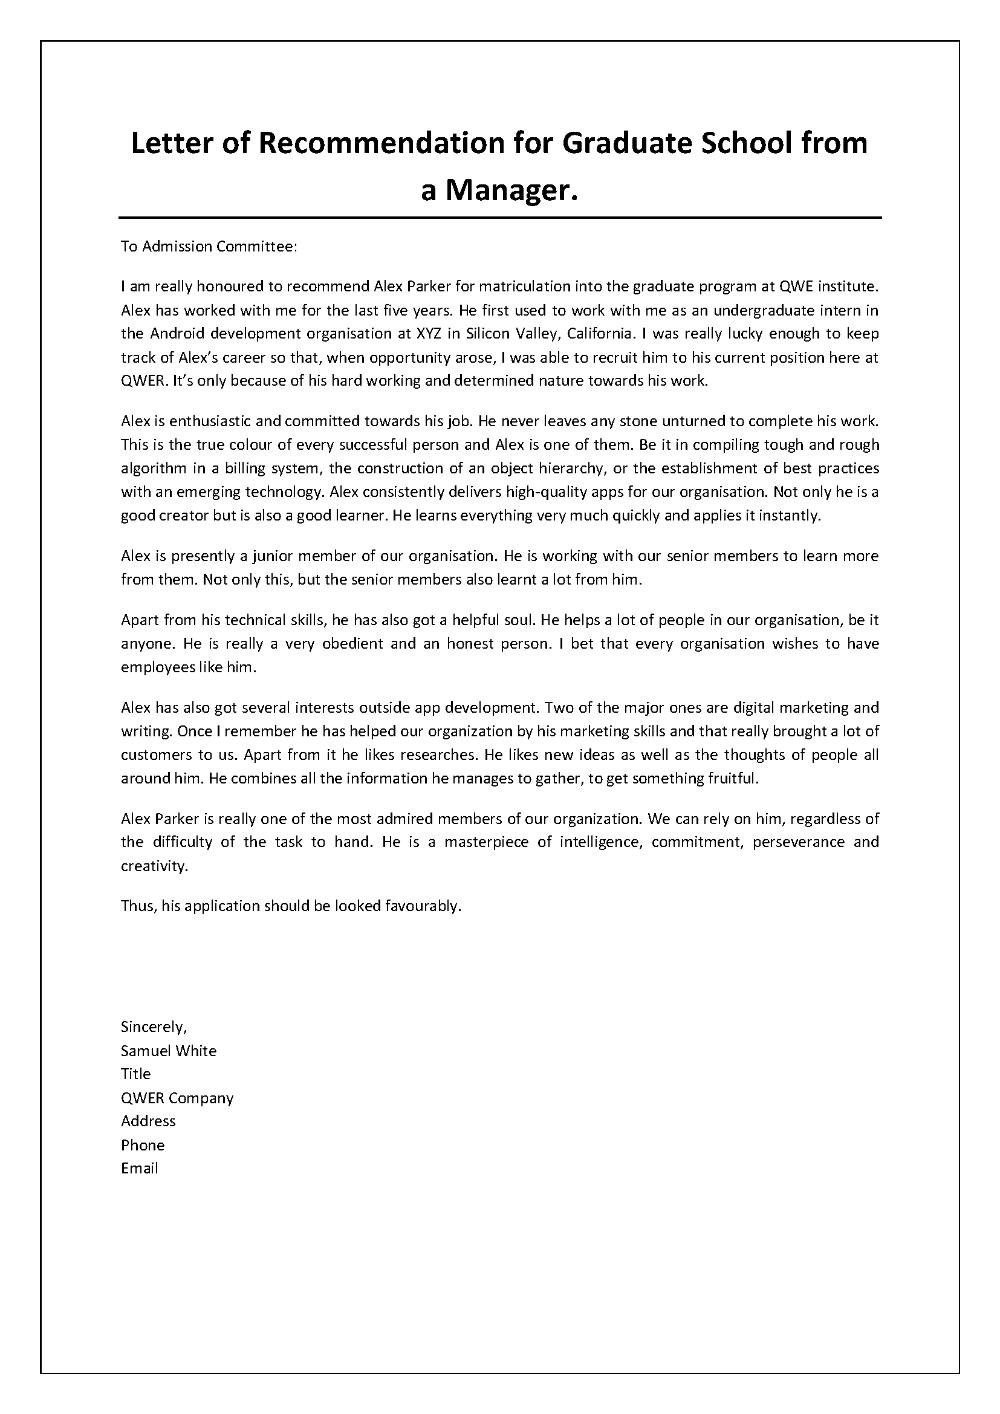 sample letter of reference lor for graduate school professional summary sales manager digital marketing personal statement cv entry level front end developer resume